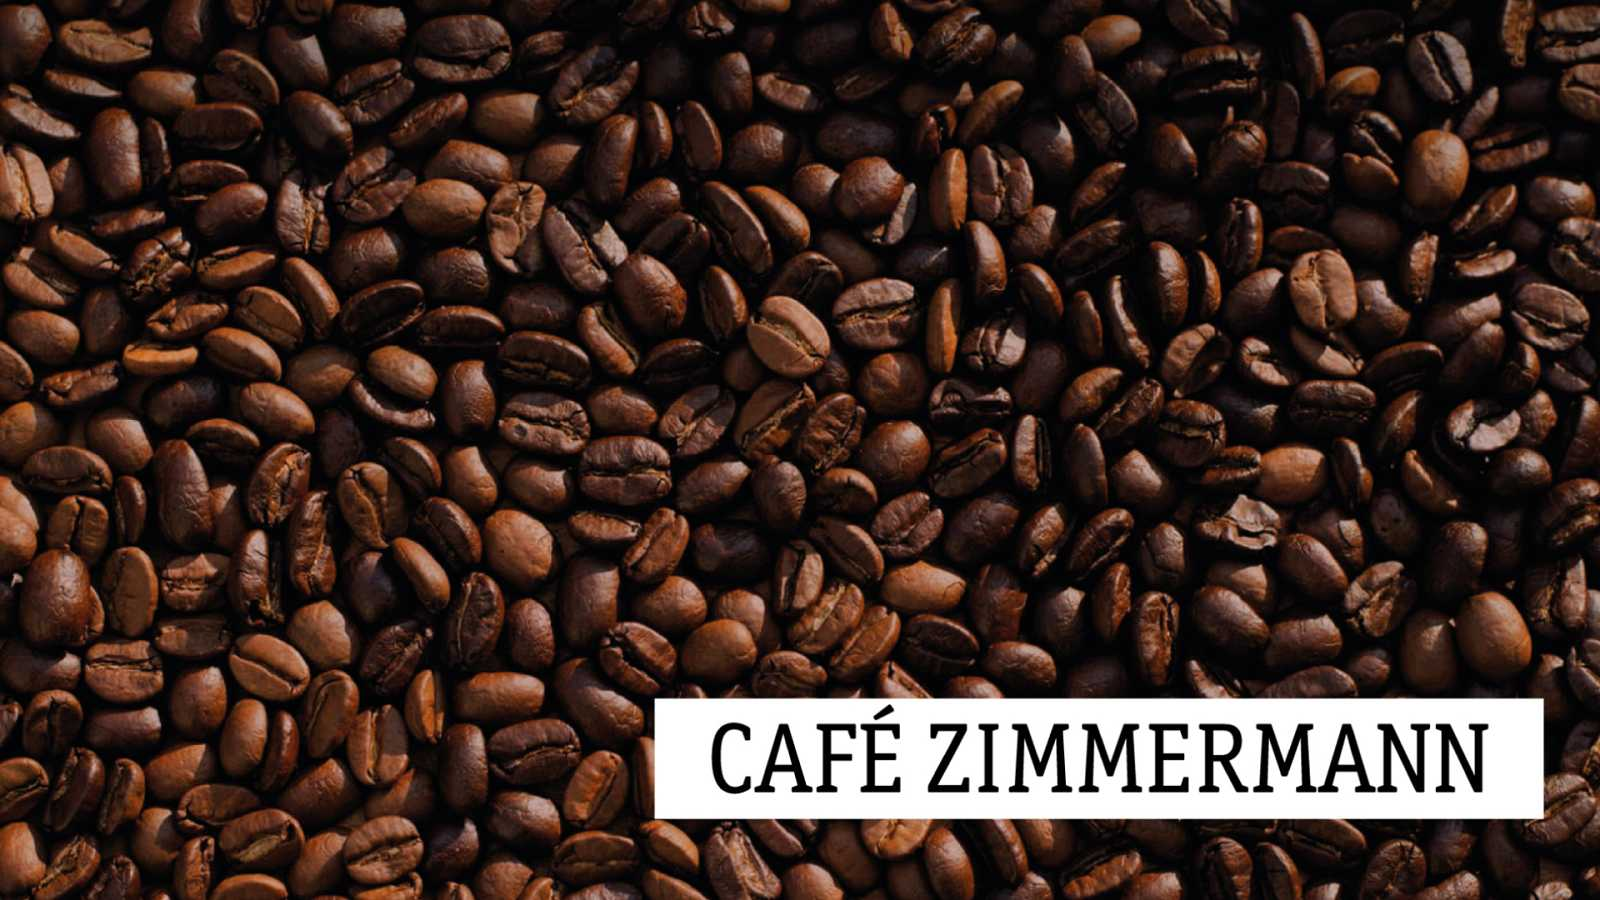 Café Zimmermann - Antón y Maite Piano Dúo  - 12/02/21 - escuchar ahora